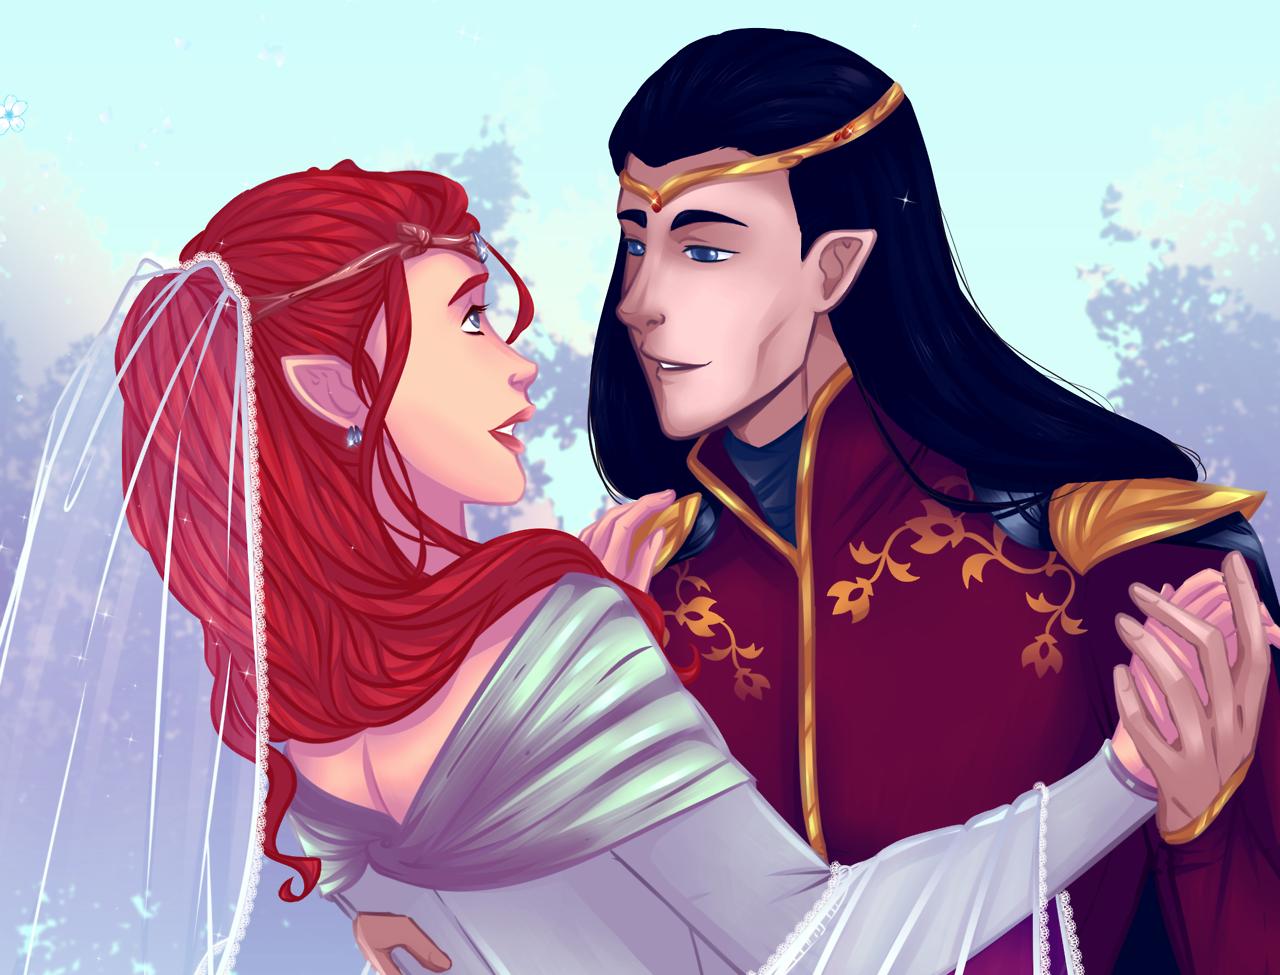 Wedding of Fëanor and Nerdanel